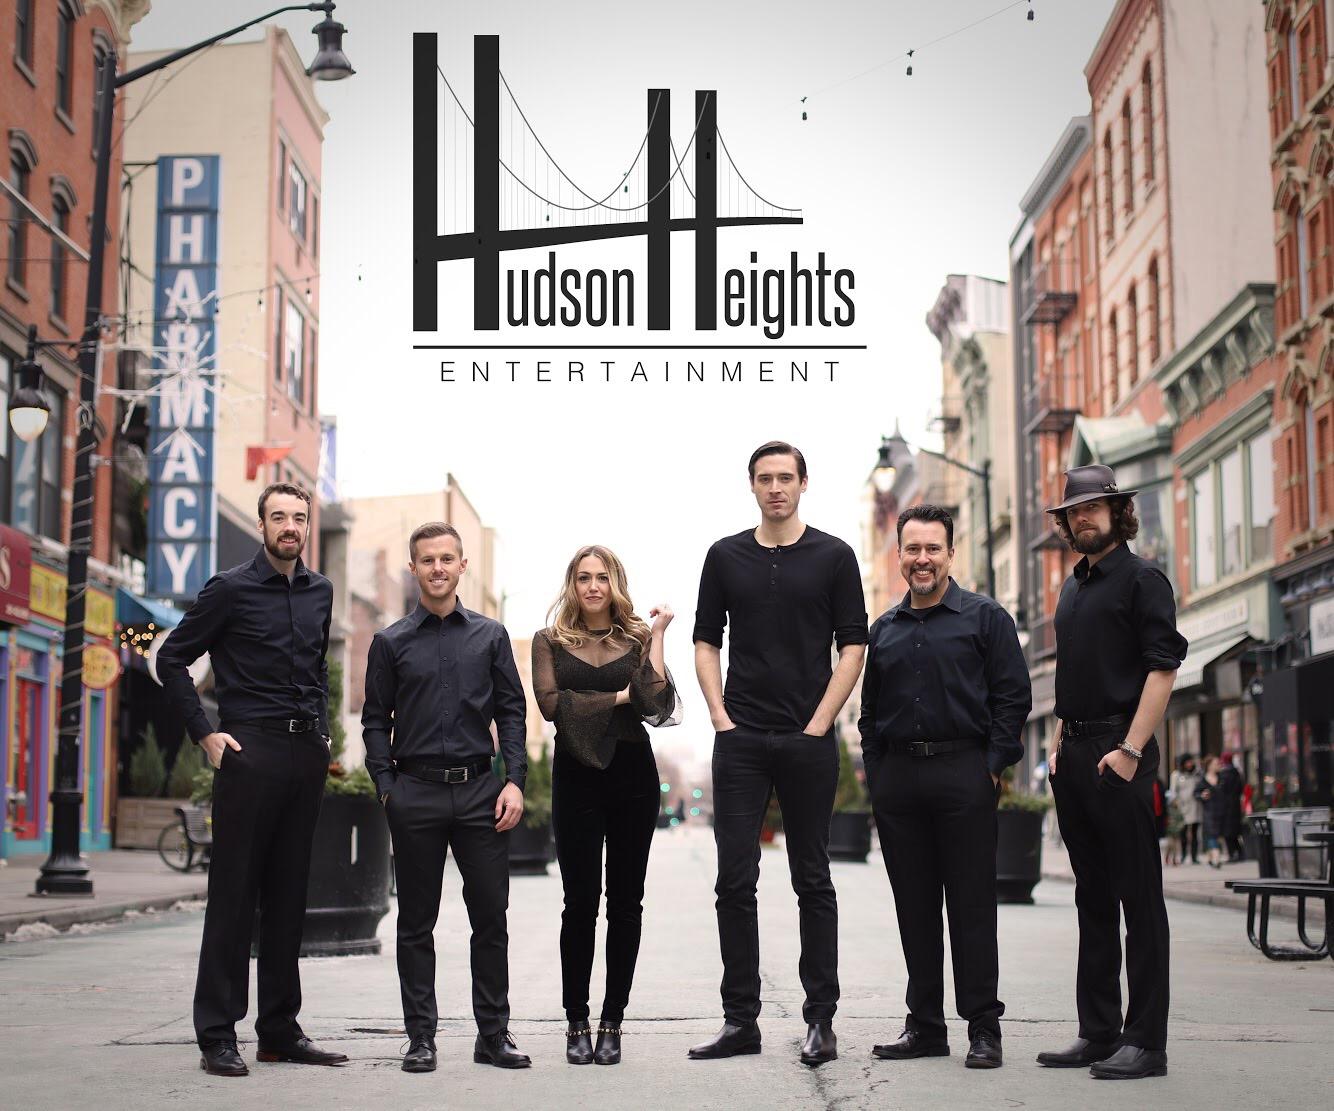 Hudson Heights - Wedding Band